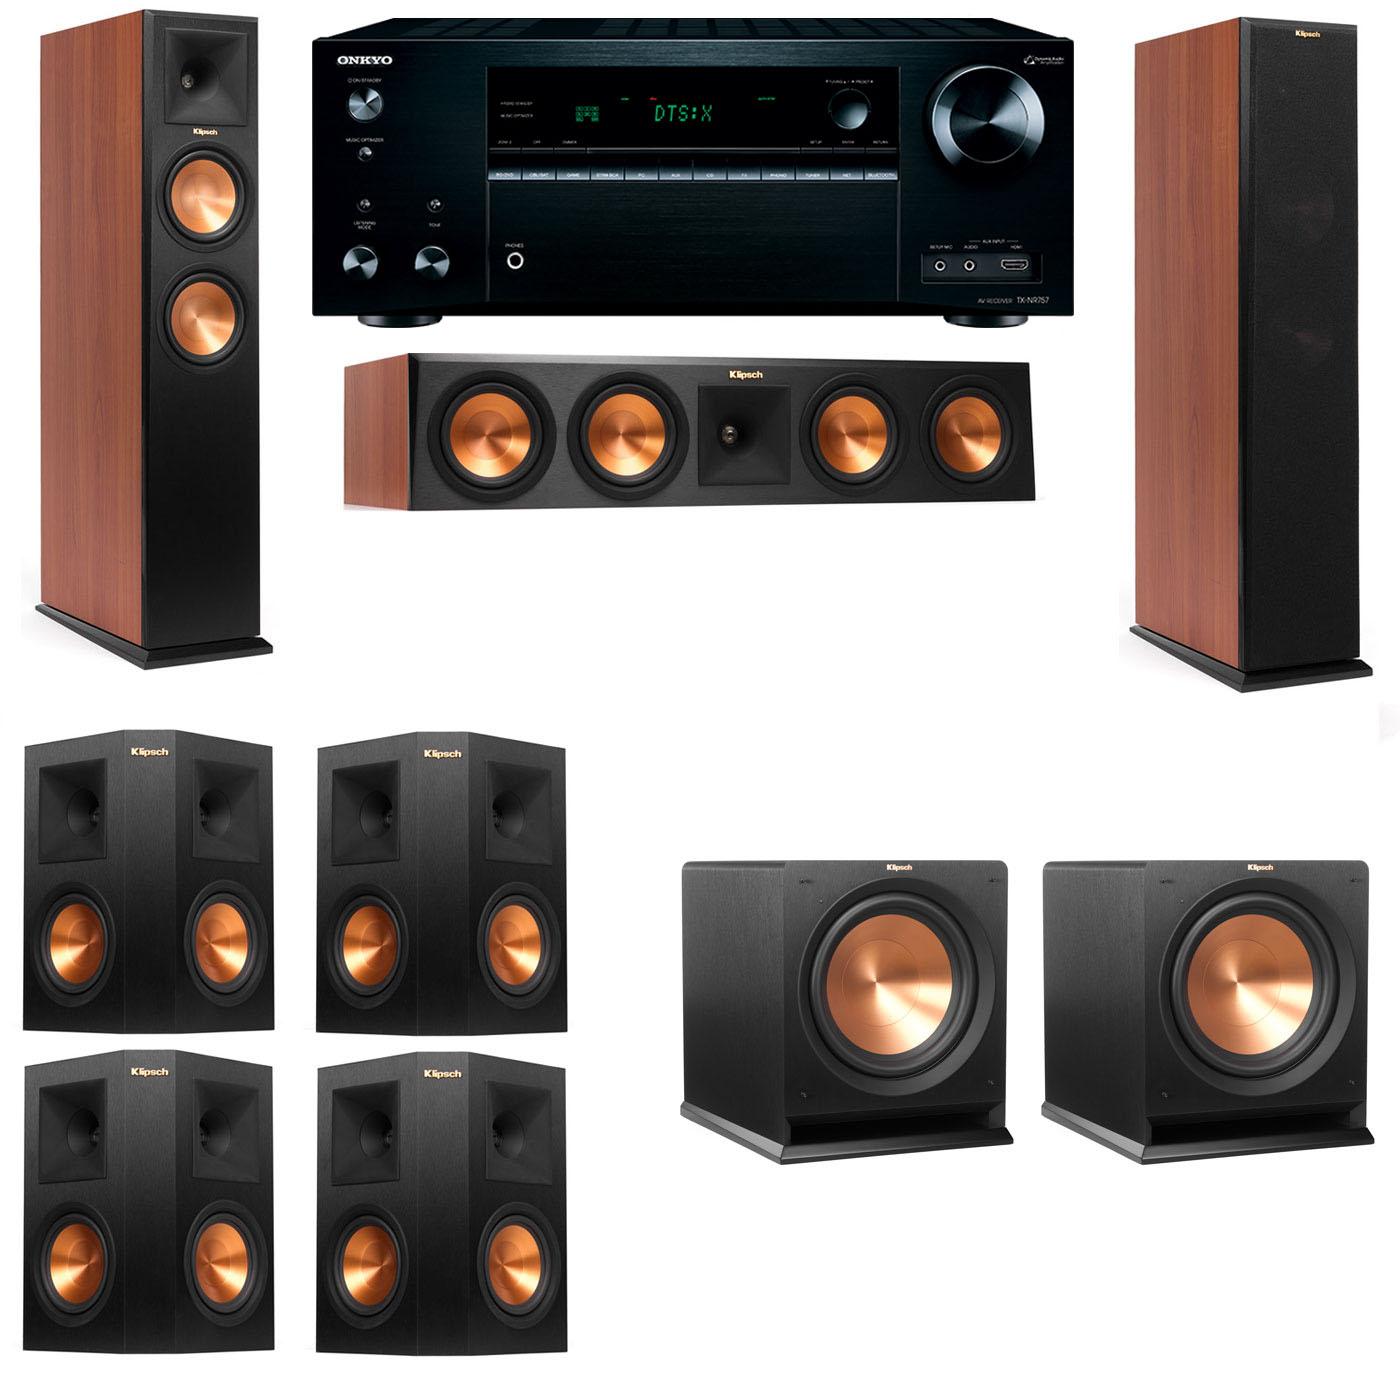 Klipsch RP-250F Tower Speakers CH-R112SW-7.2-Onkyo TX-NR757